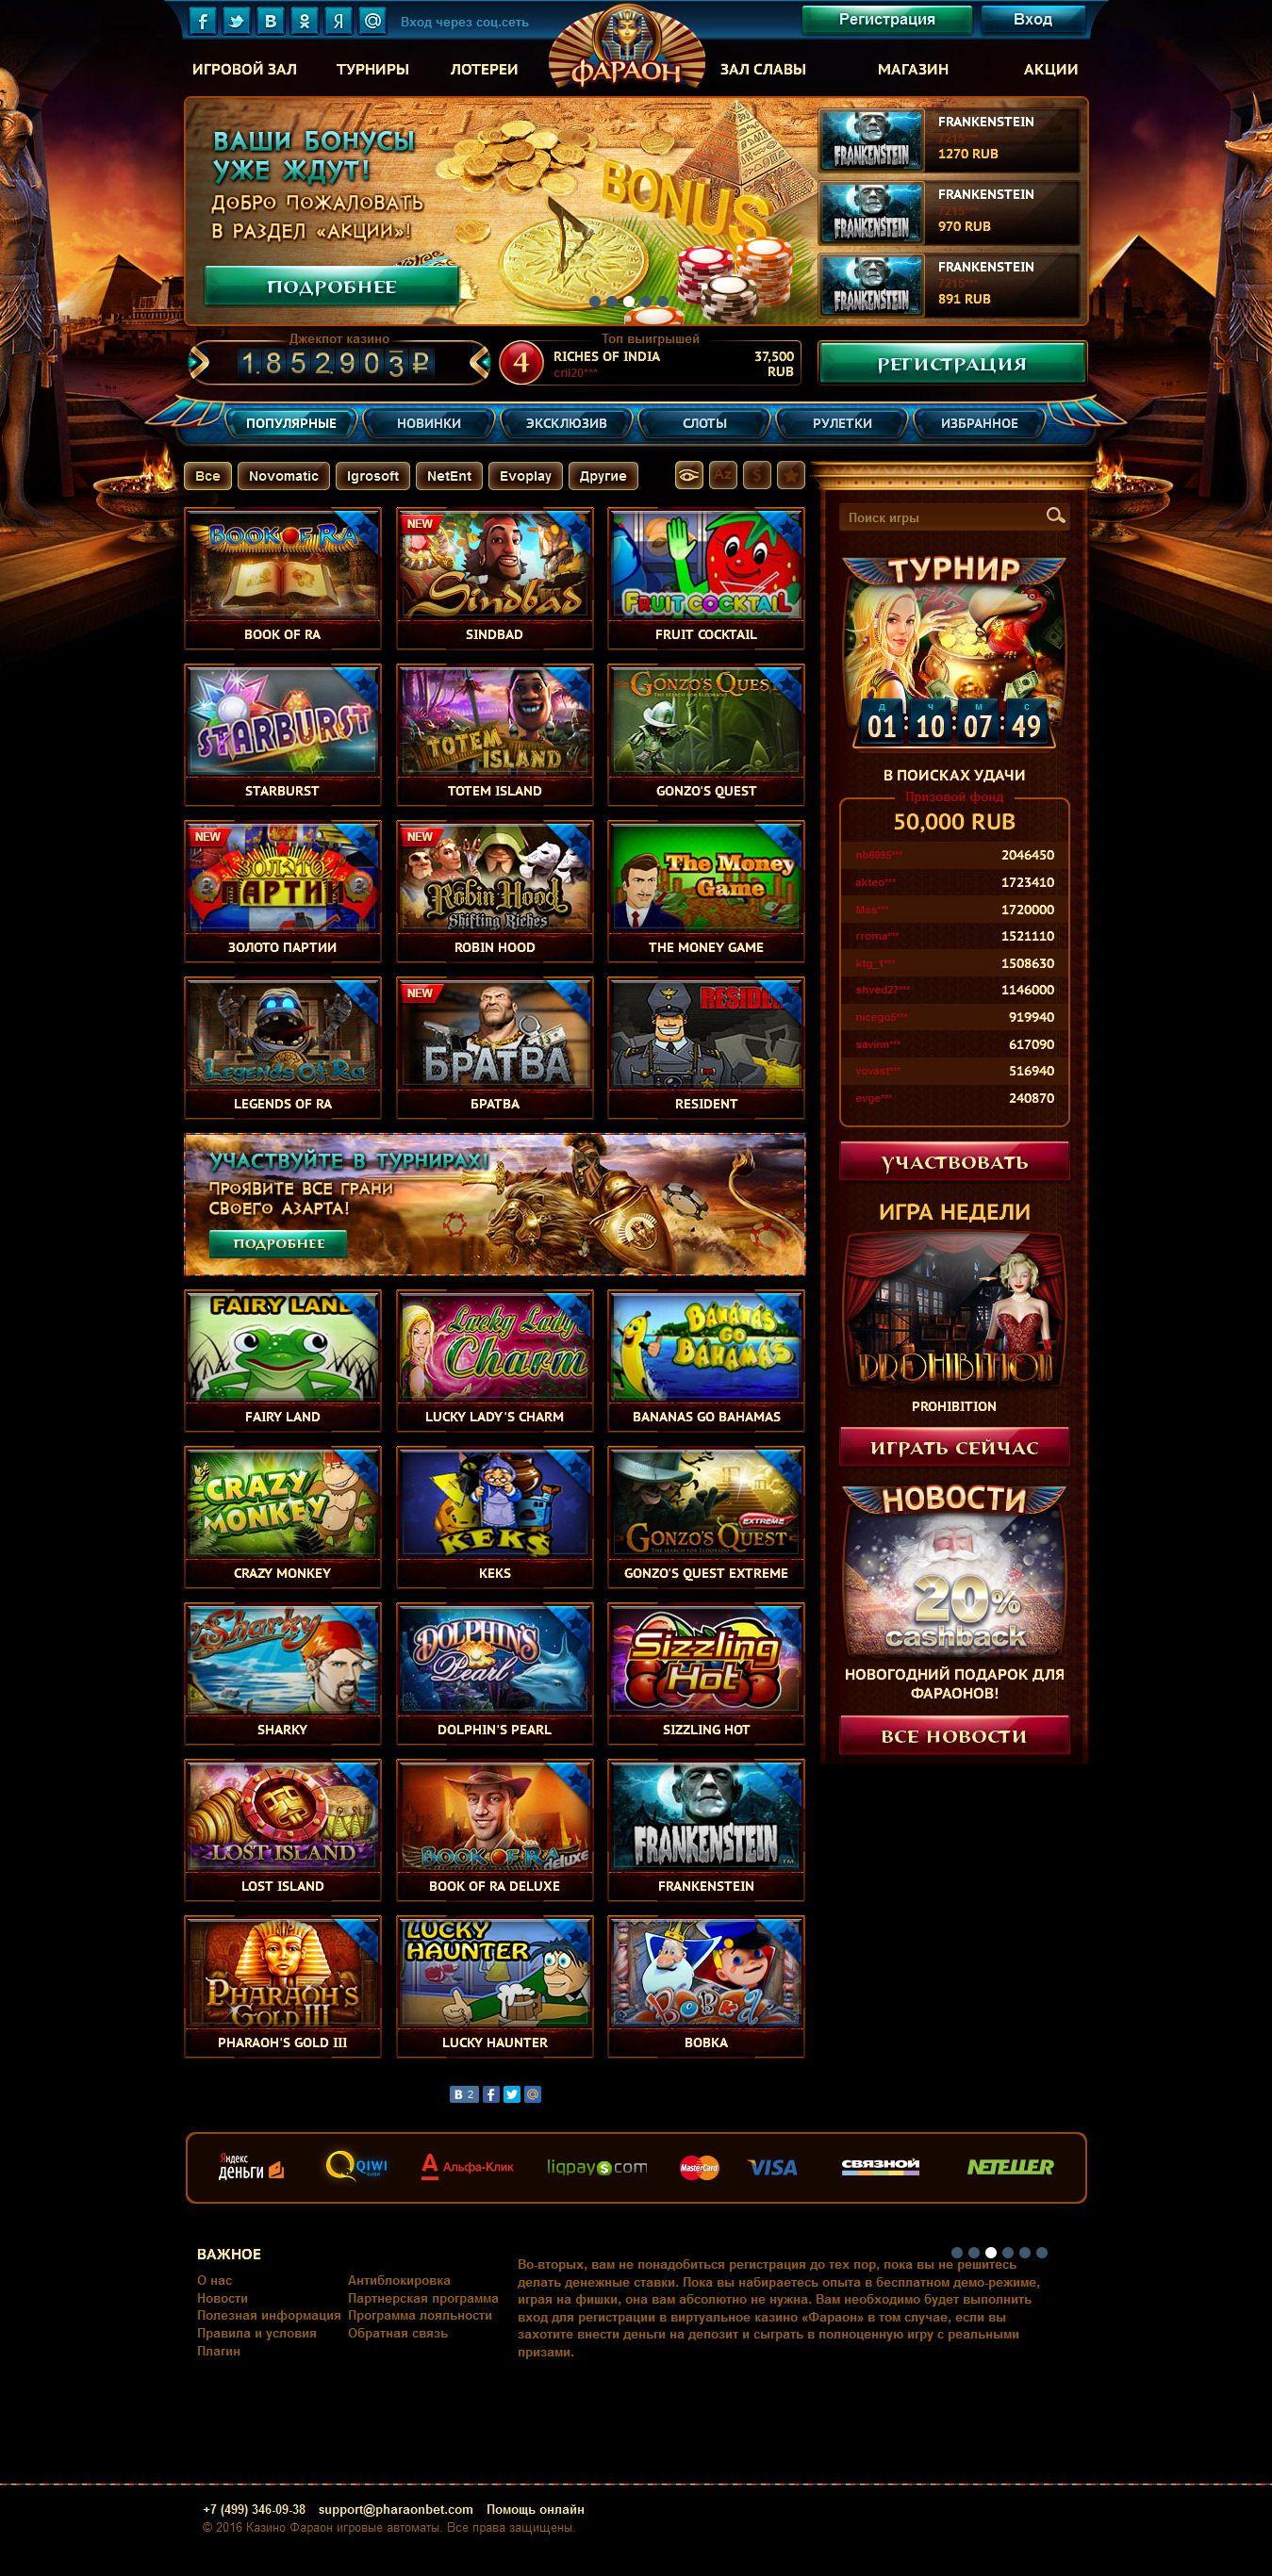 Бонус в казино без вложений